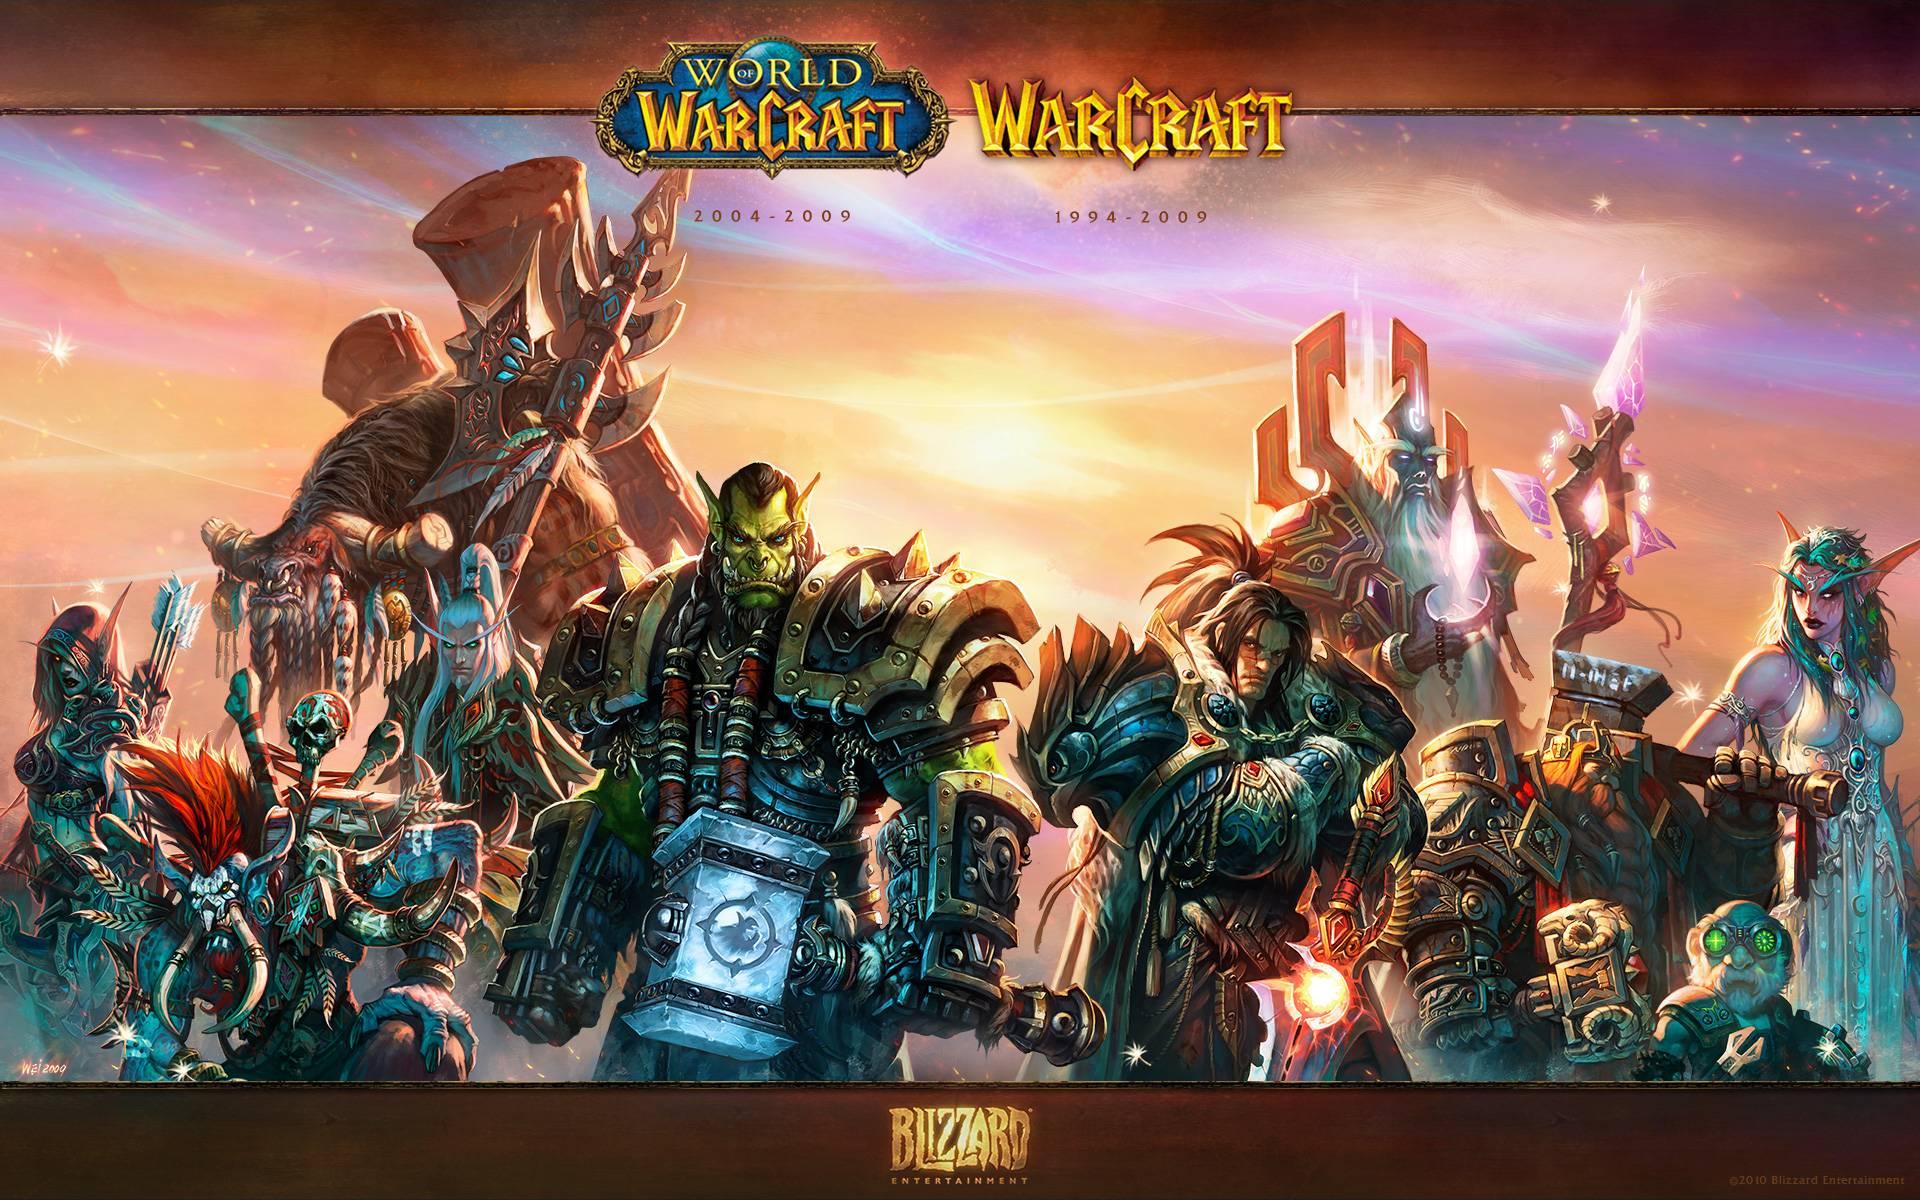 Free Download World Of Warcraft Wallpaper Alliance Vs Horde